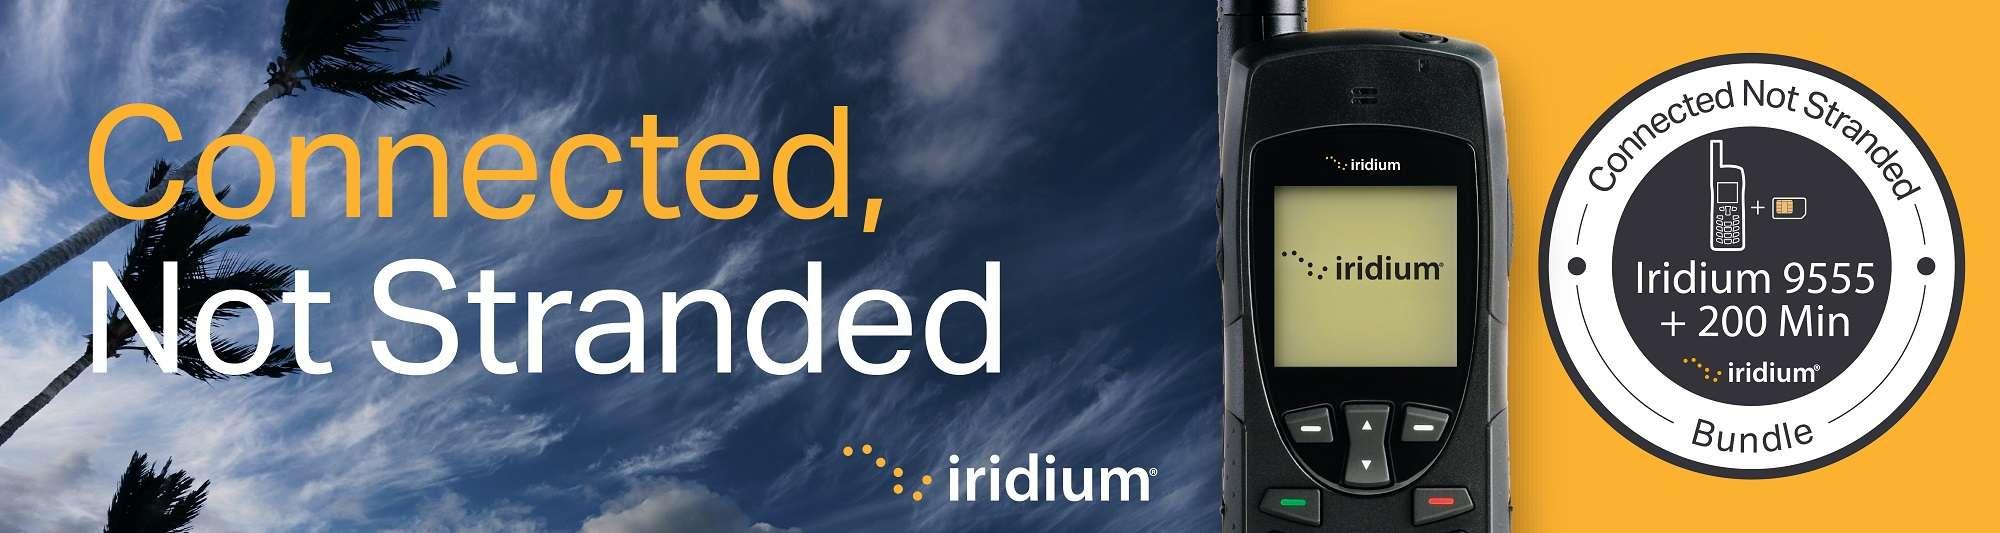 Iridium Connected not Stranded 9555 Satellite Phone Promotion